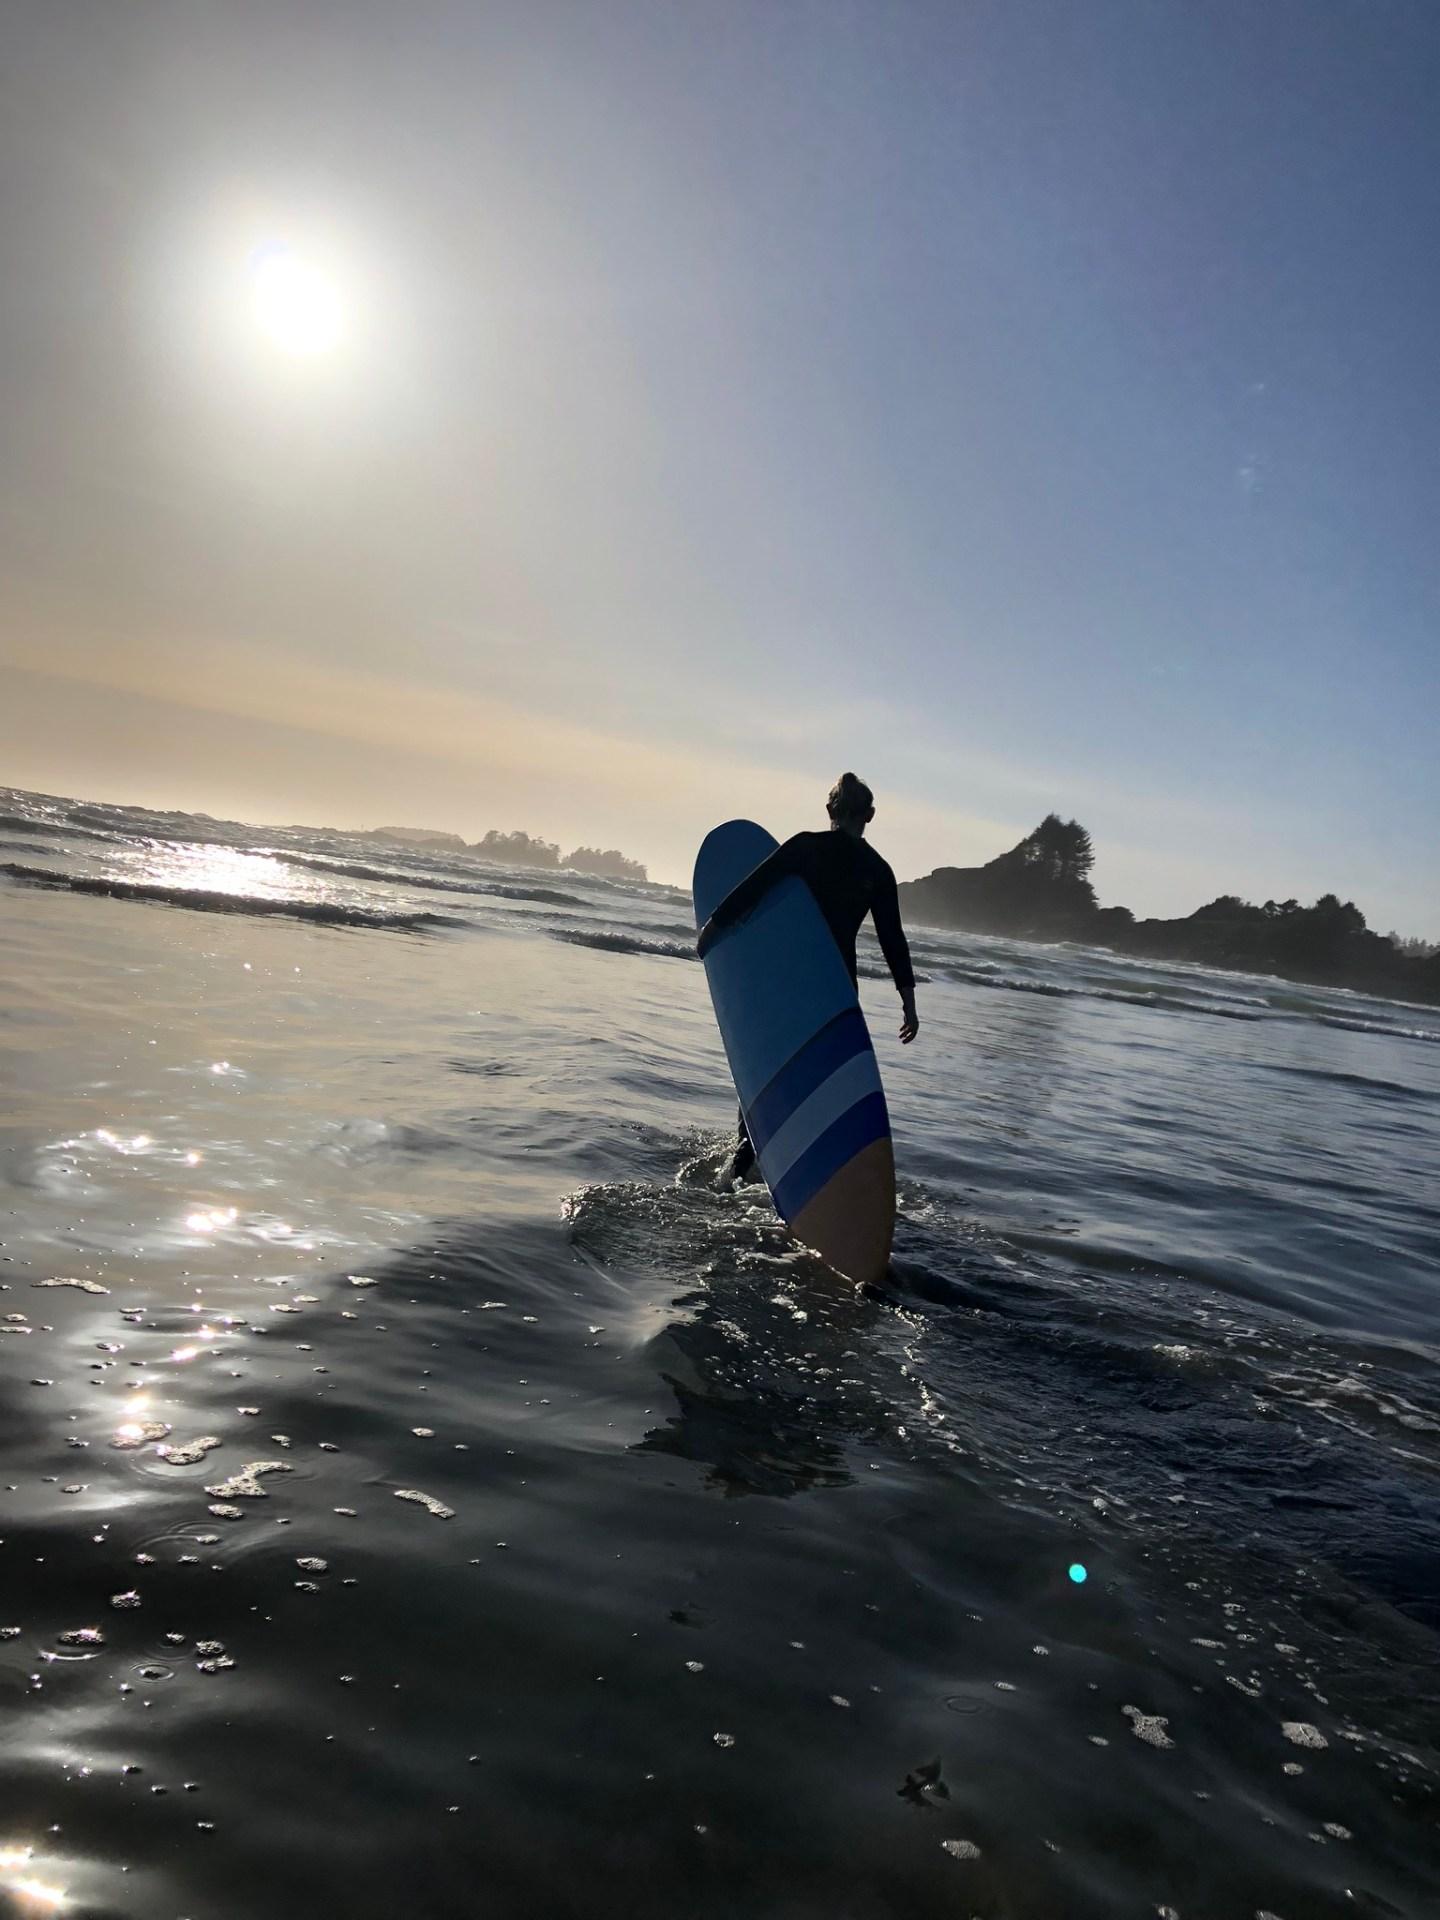 Surfing in Tofino